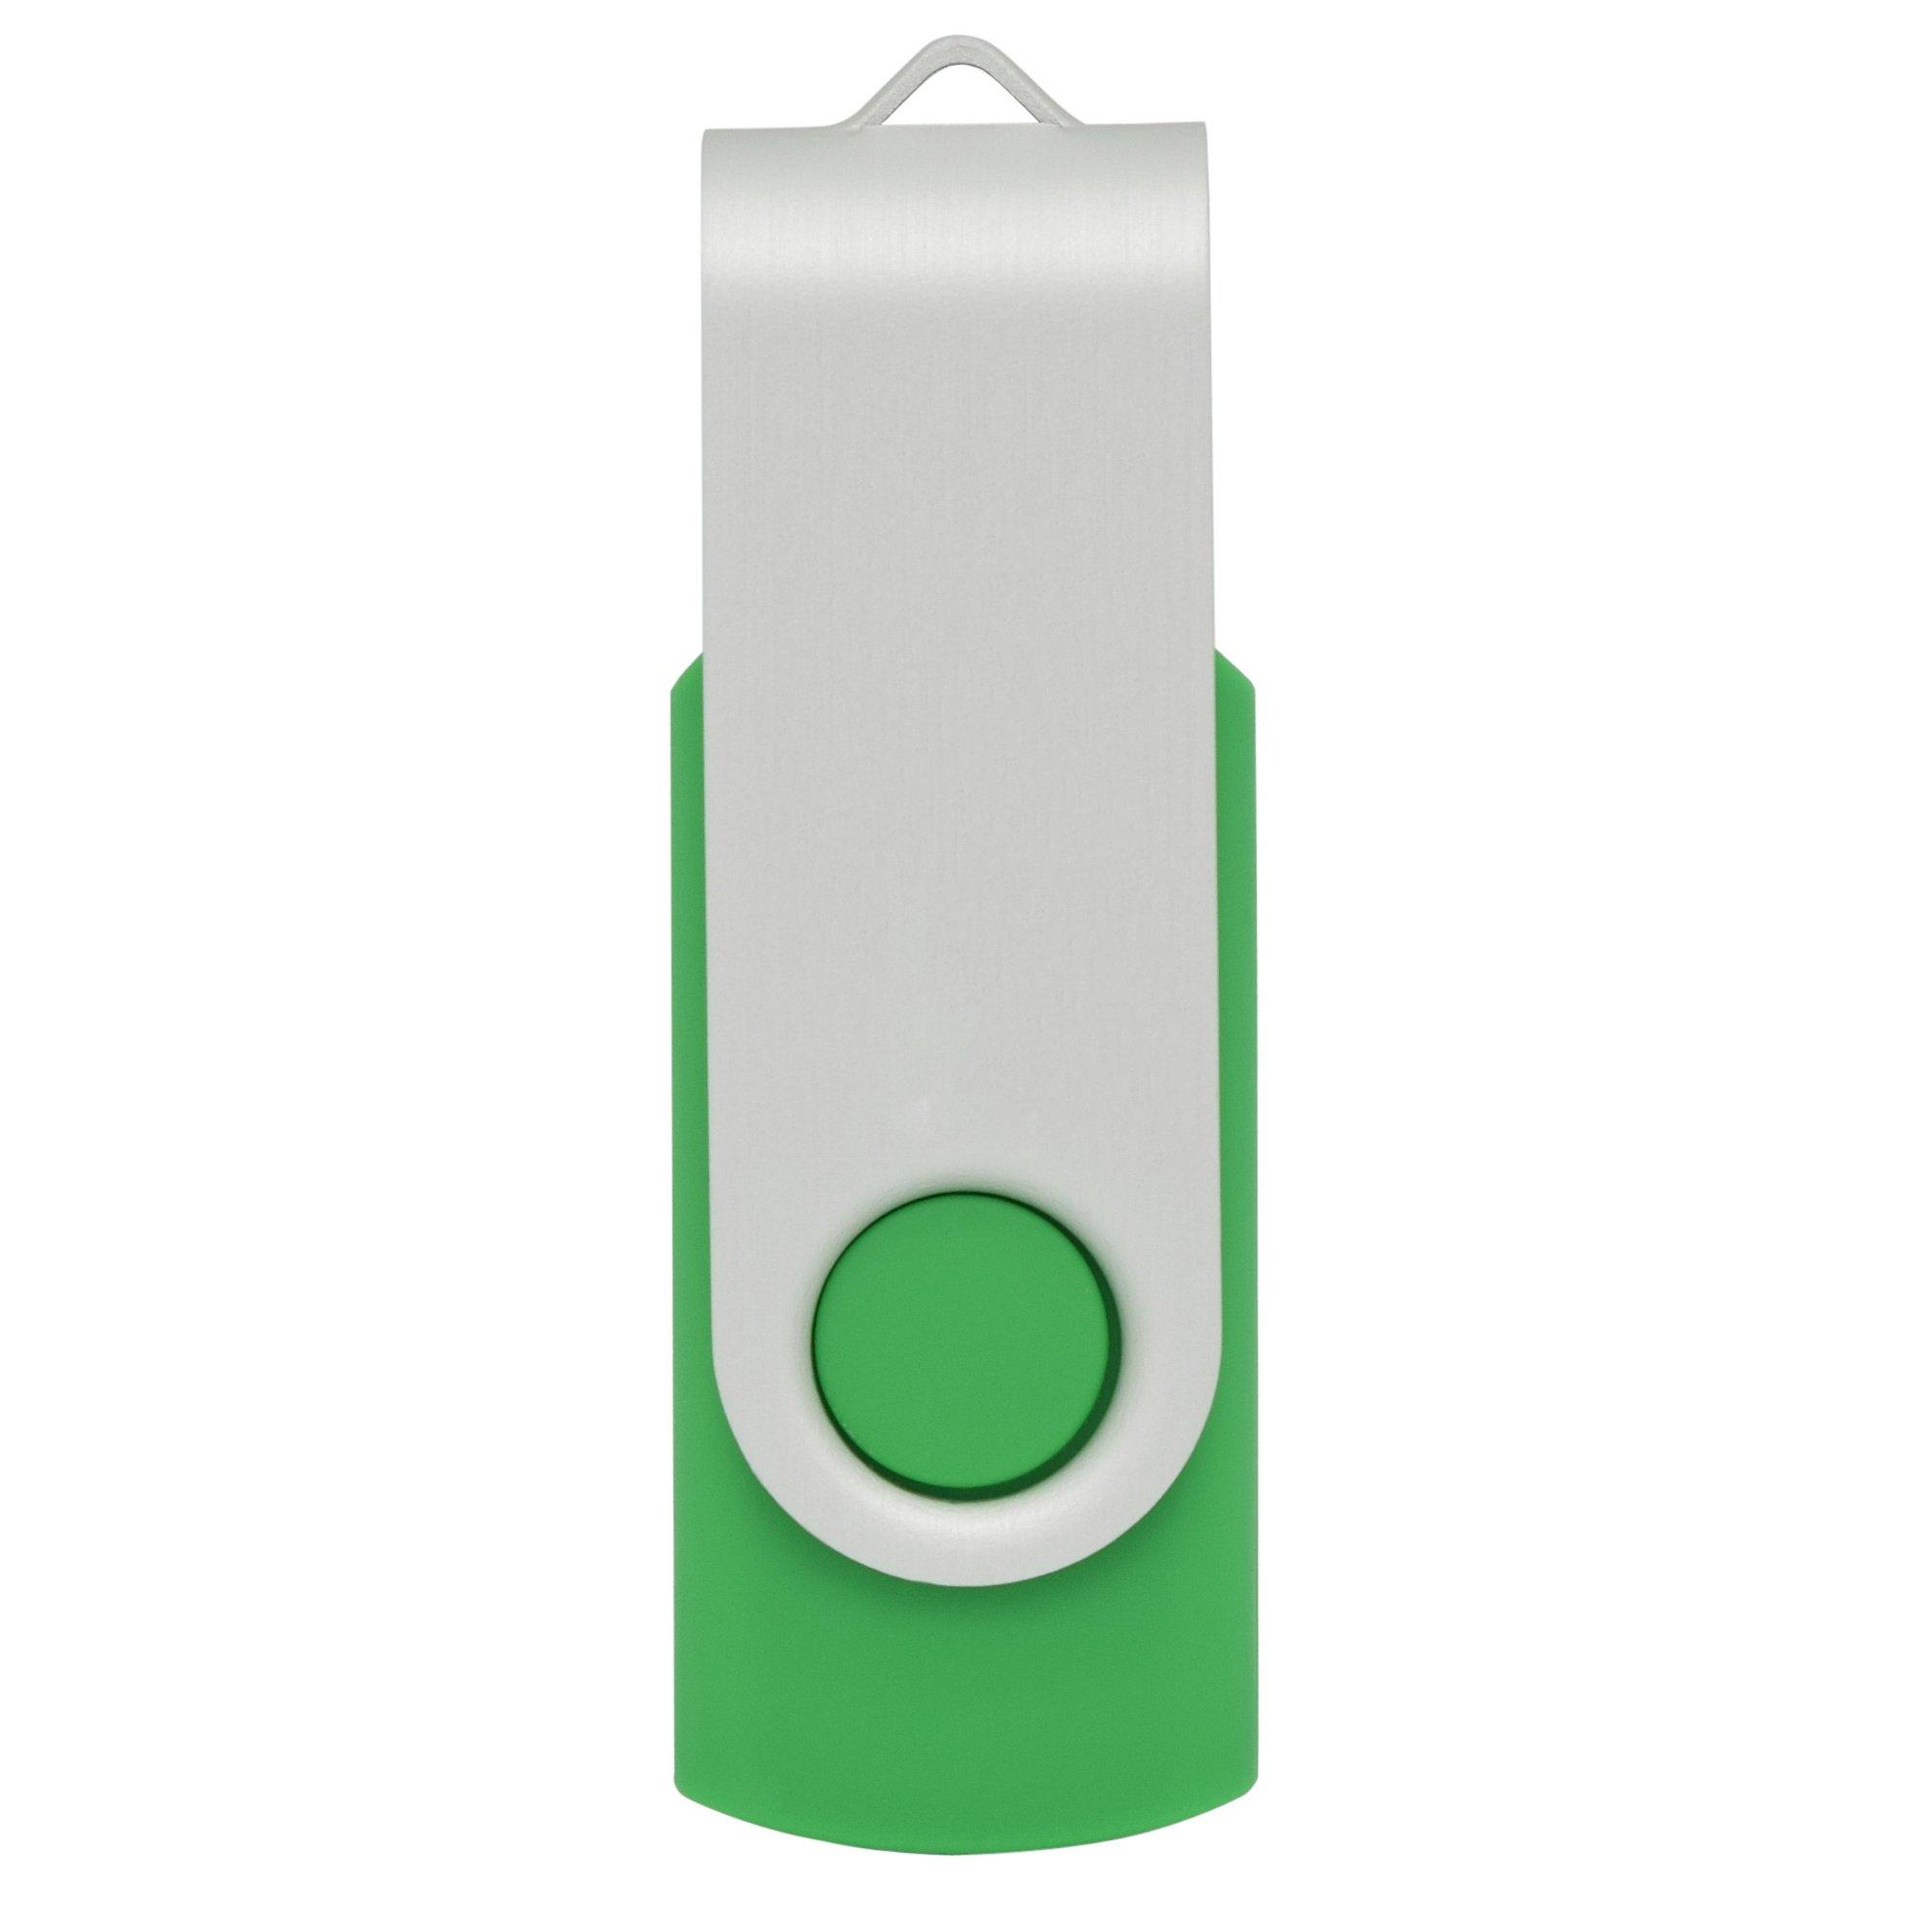 BlastCase 10pcs 4GB 4G USB 2.0 Flash Drive Memory Stick Fold Storage Thumb Stick Pen Swivel Design Green by BlastCase (Image #1)